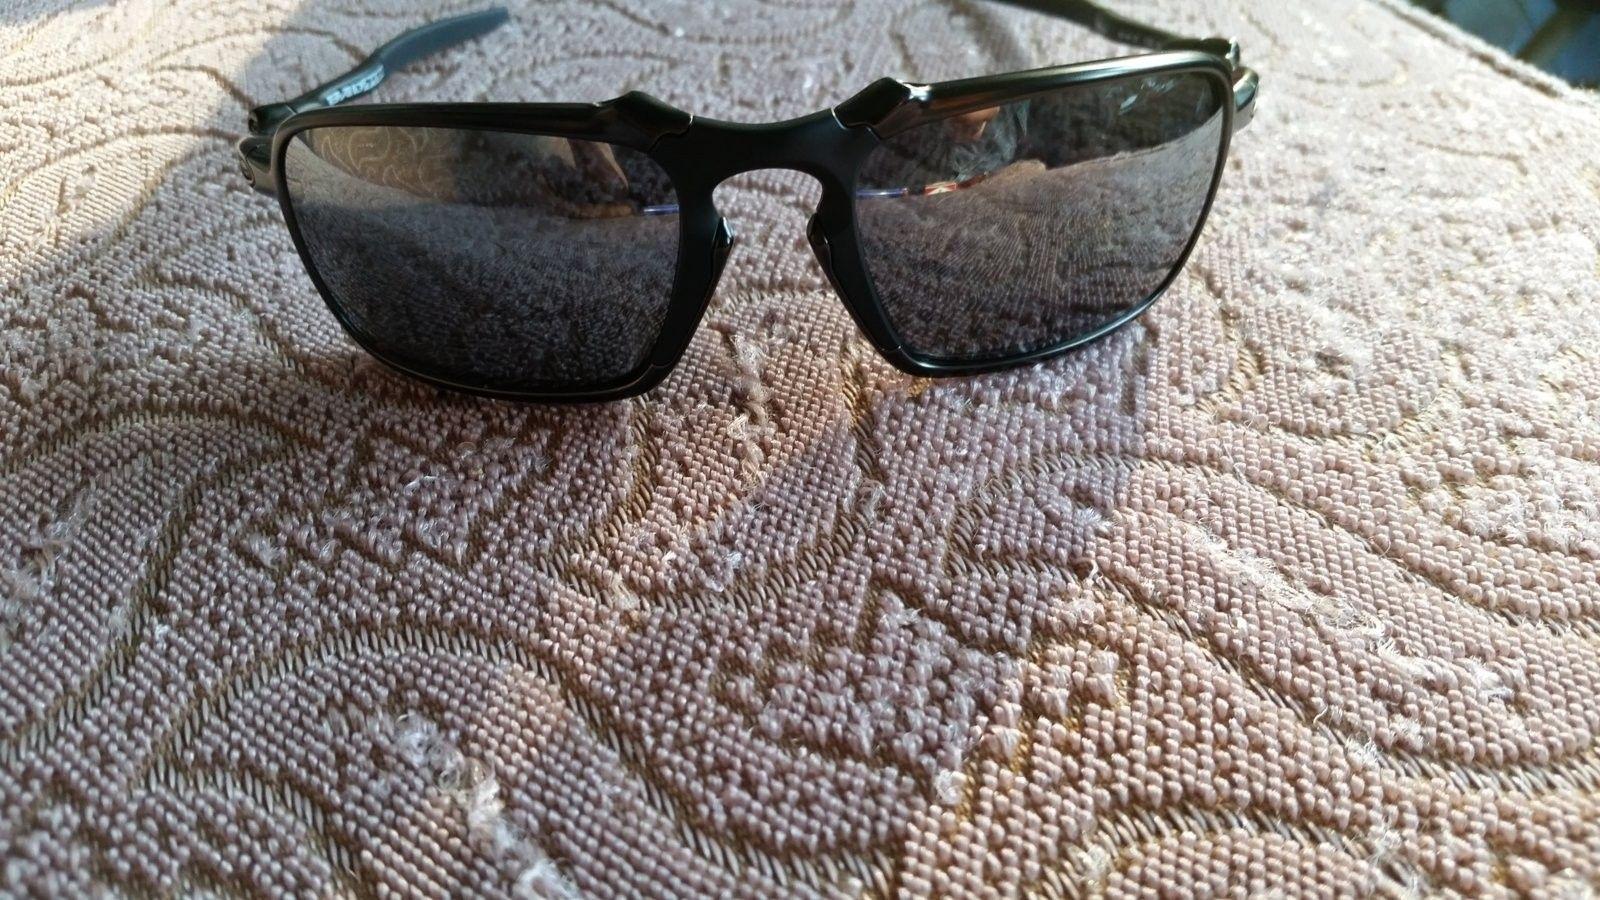 Badman purchase - 1472823506707-681131016.jpg